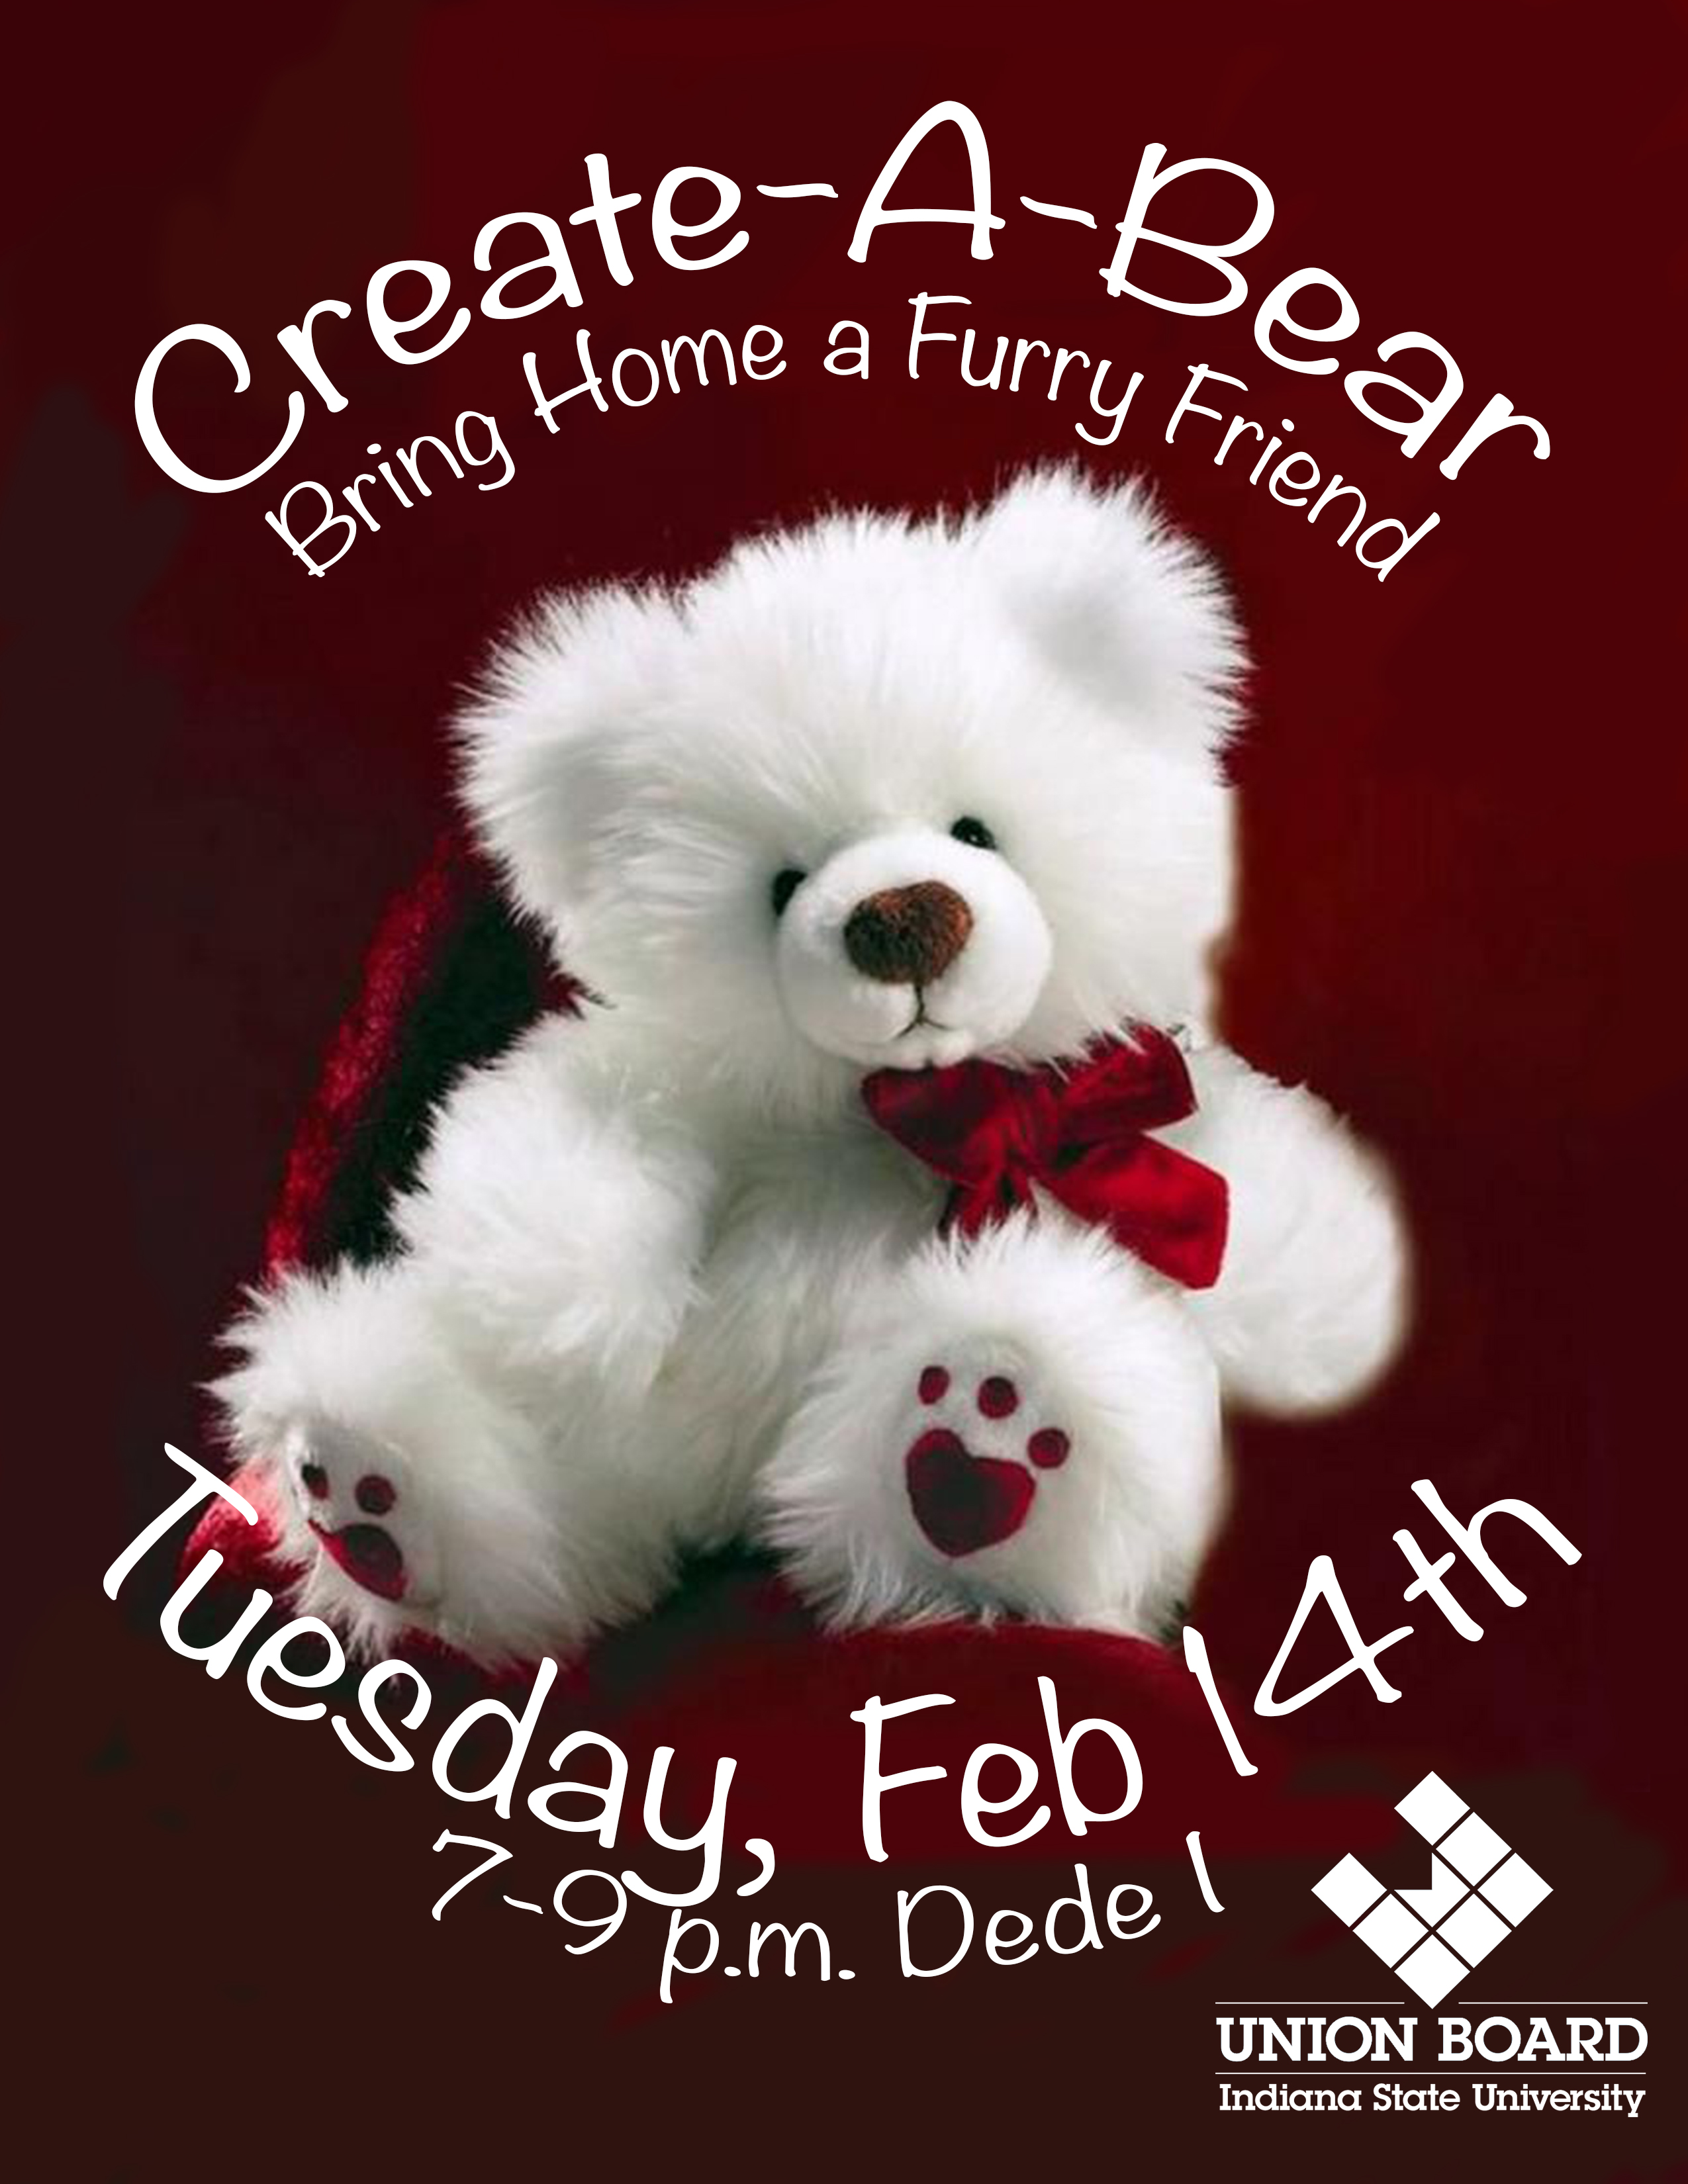 Create A Bear sponsored by Union Board